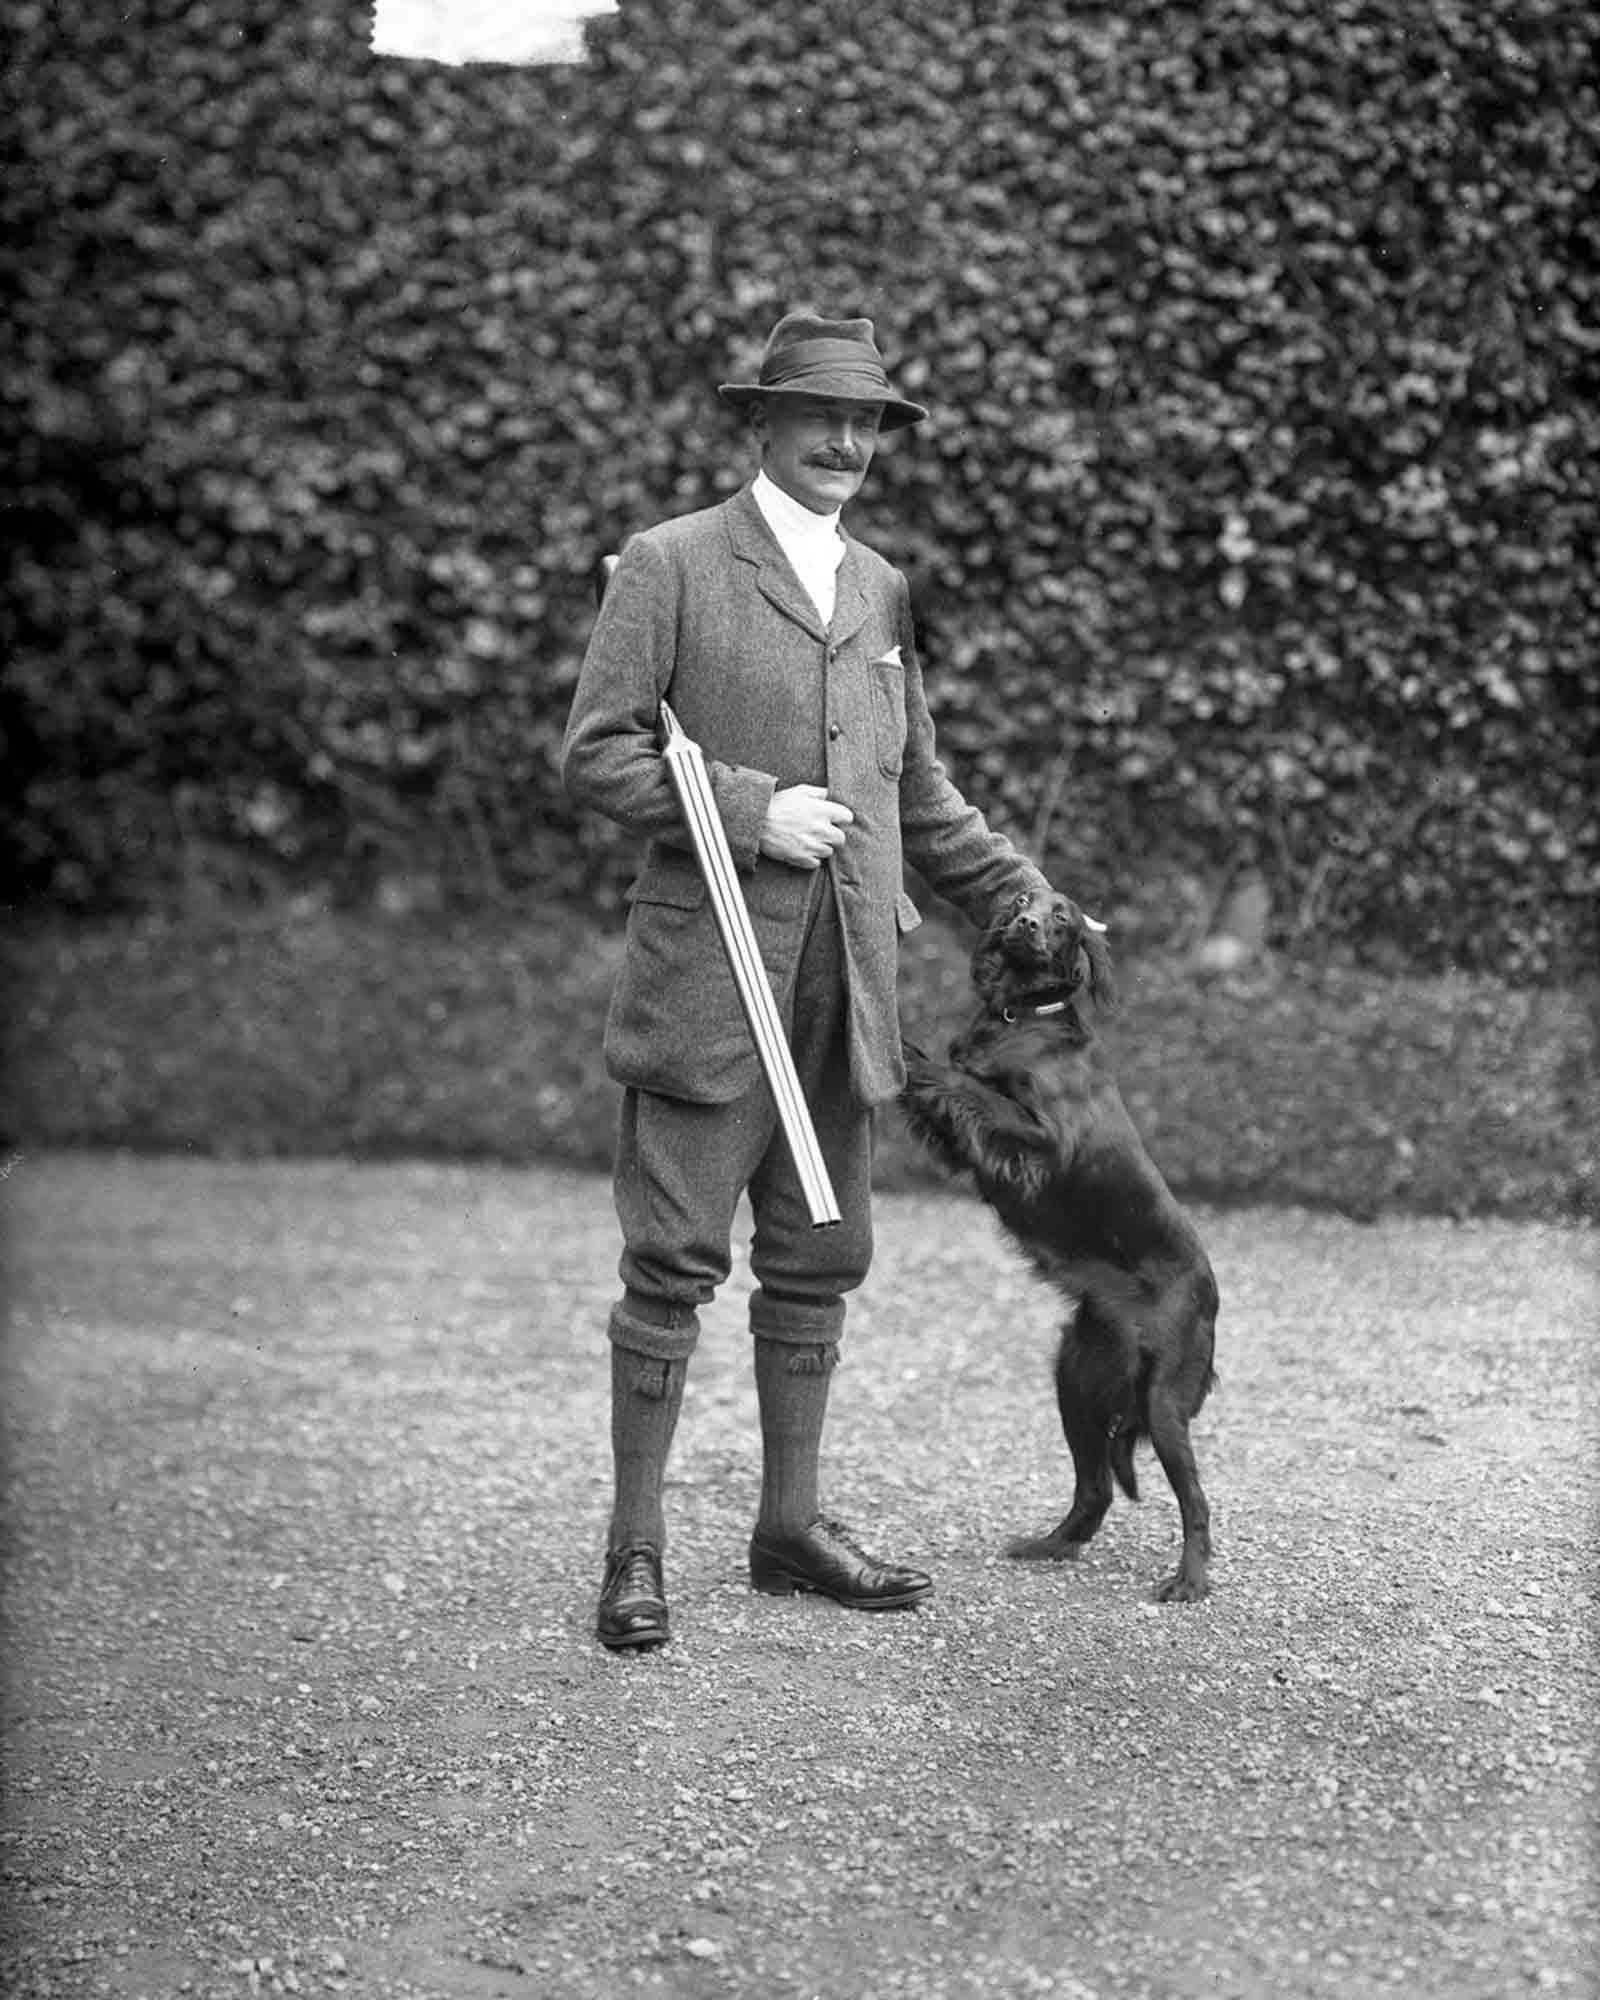 Sir Hercules Robert Langrishe, 5th Baronet Langrishe and his dog. 1913.